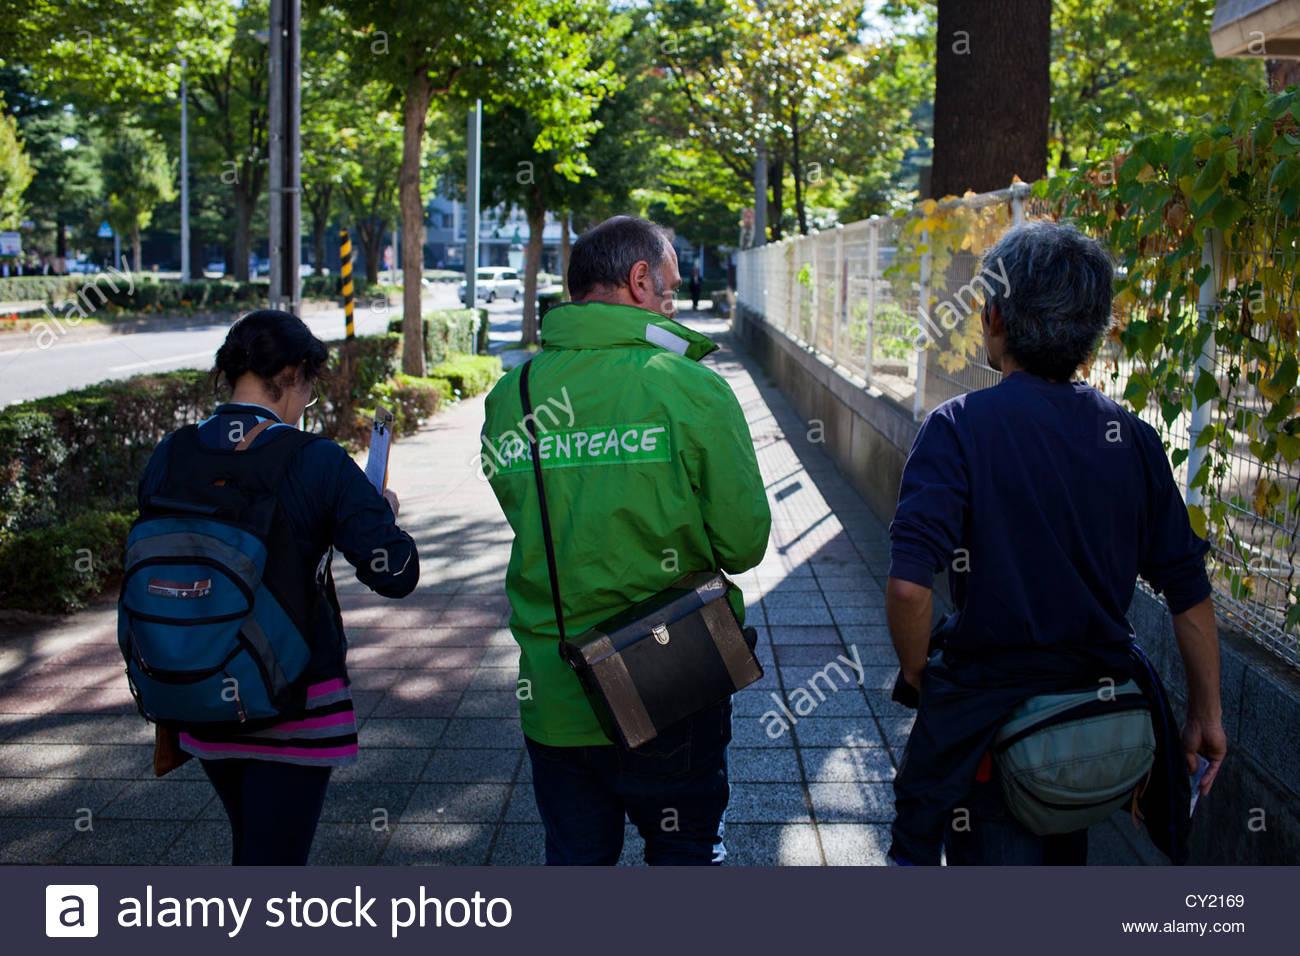 A Greenpeace radiation monitoring team checks contamination levels in Fukushima city. - Stock Image